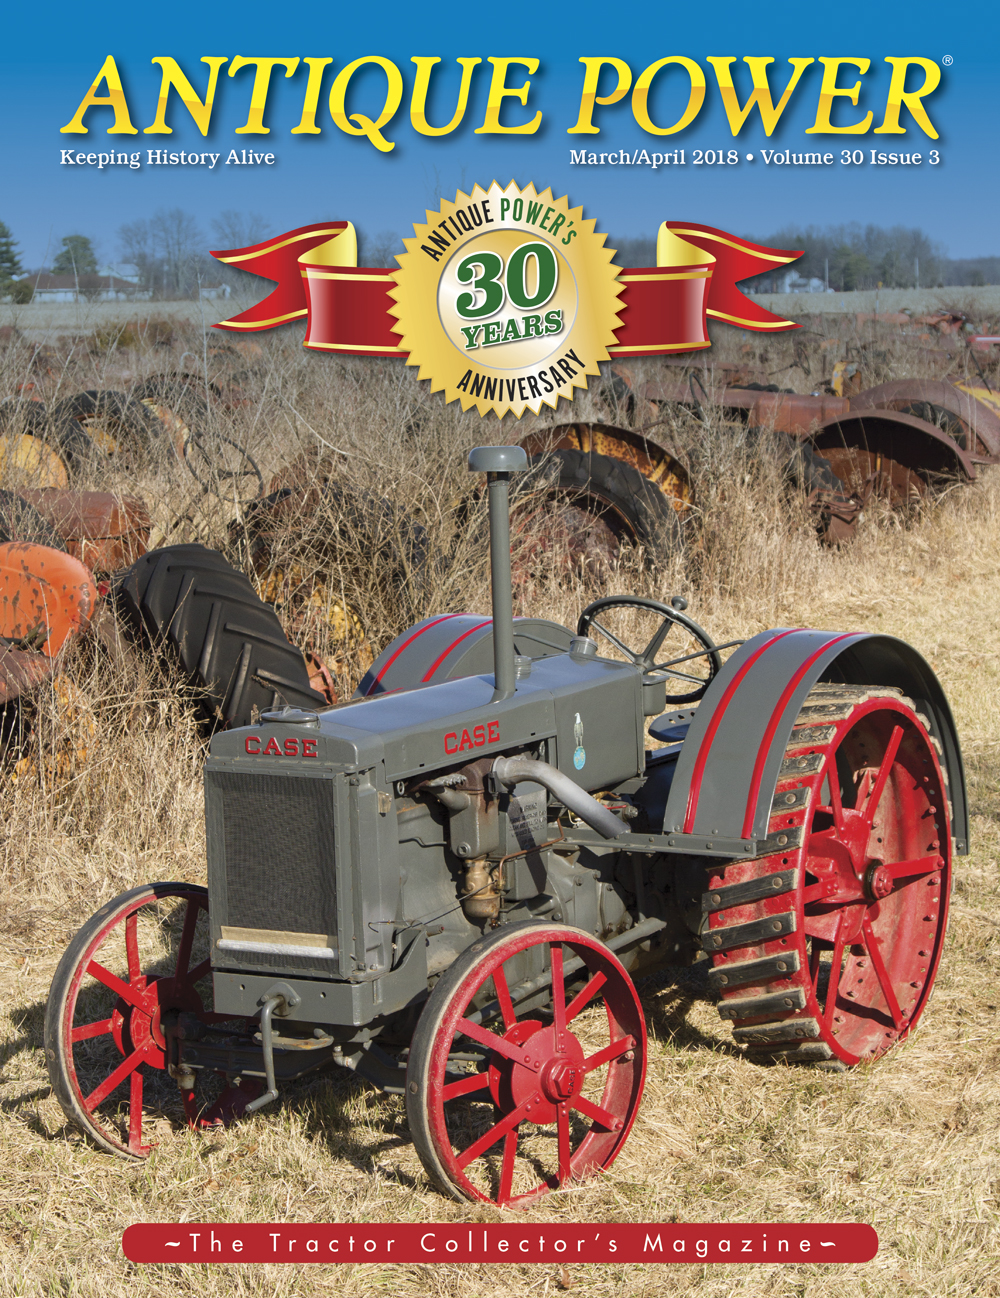 Antique Power magazine